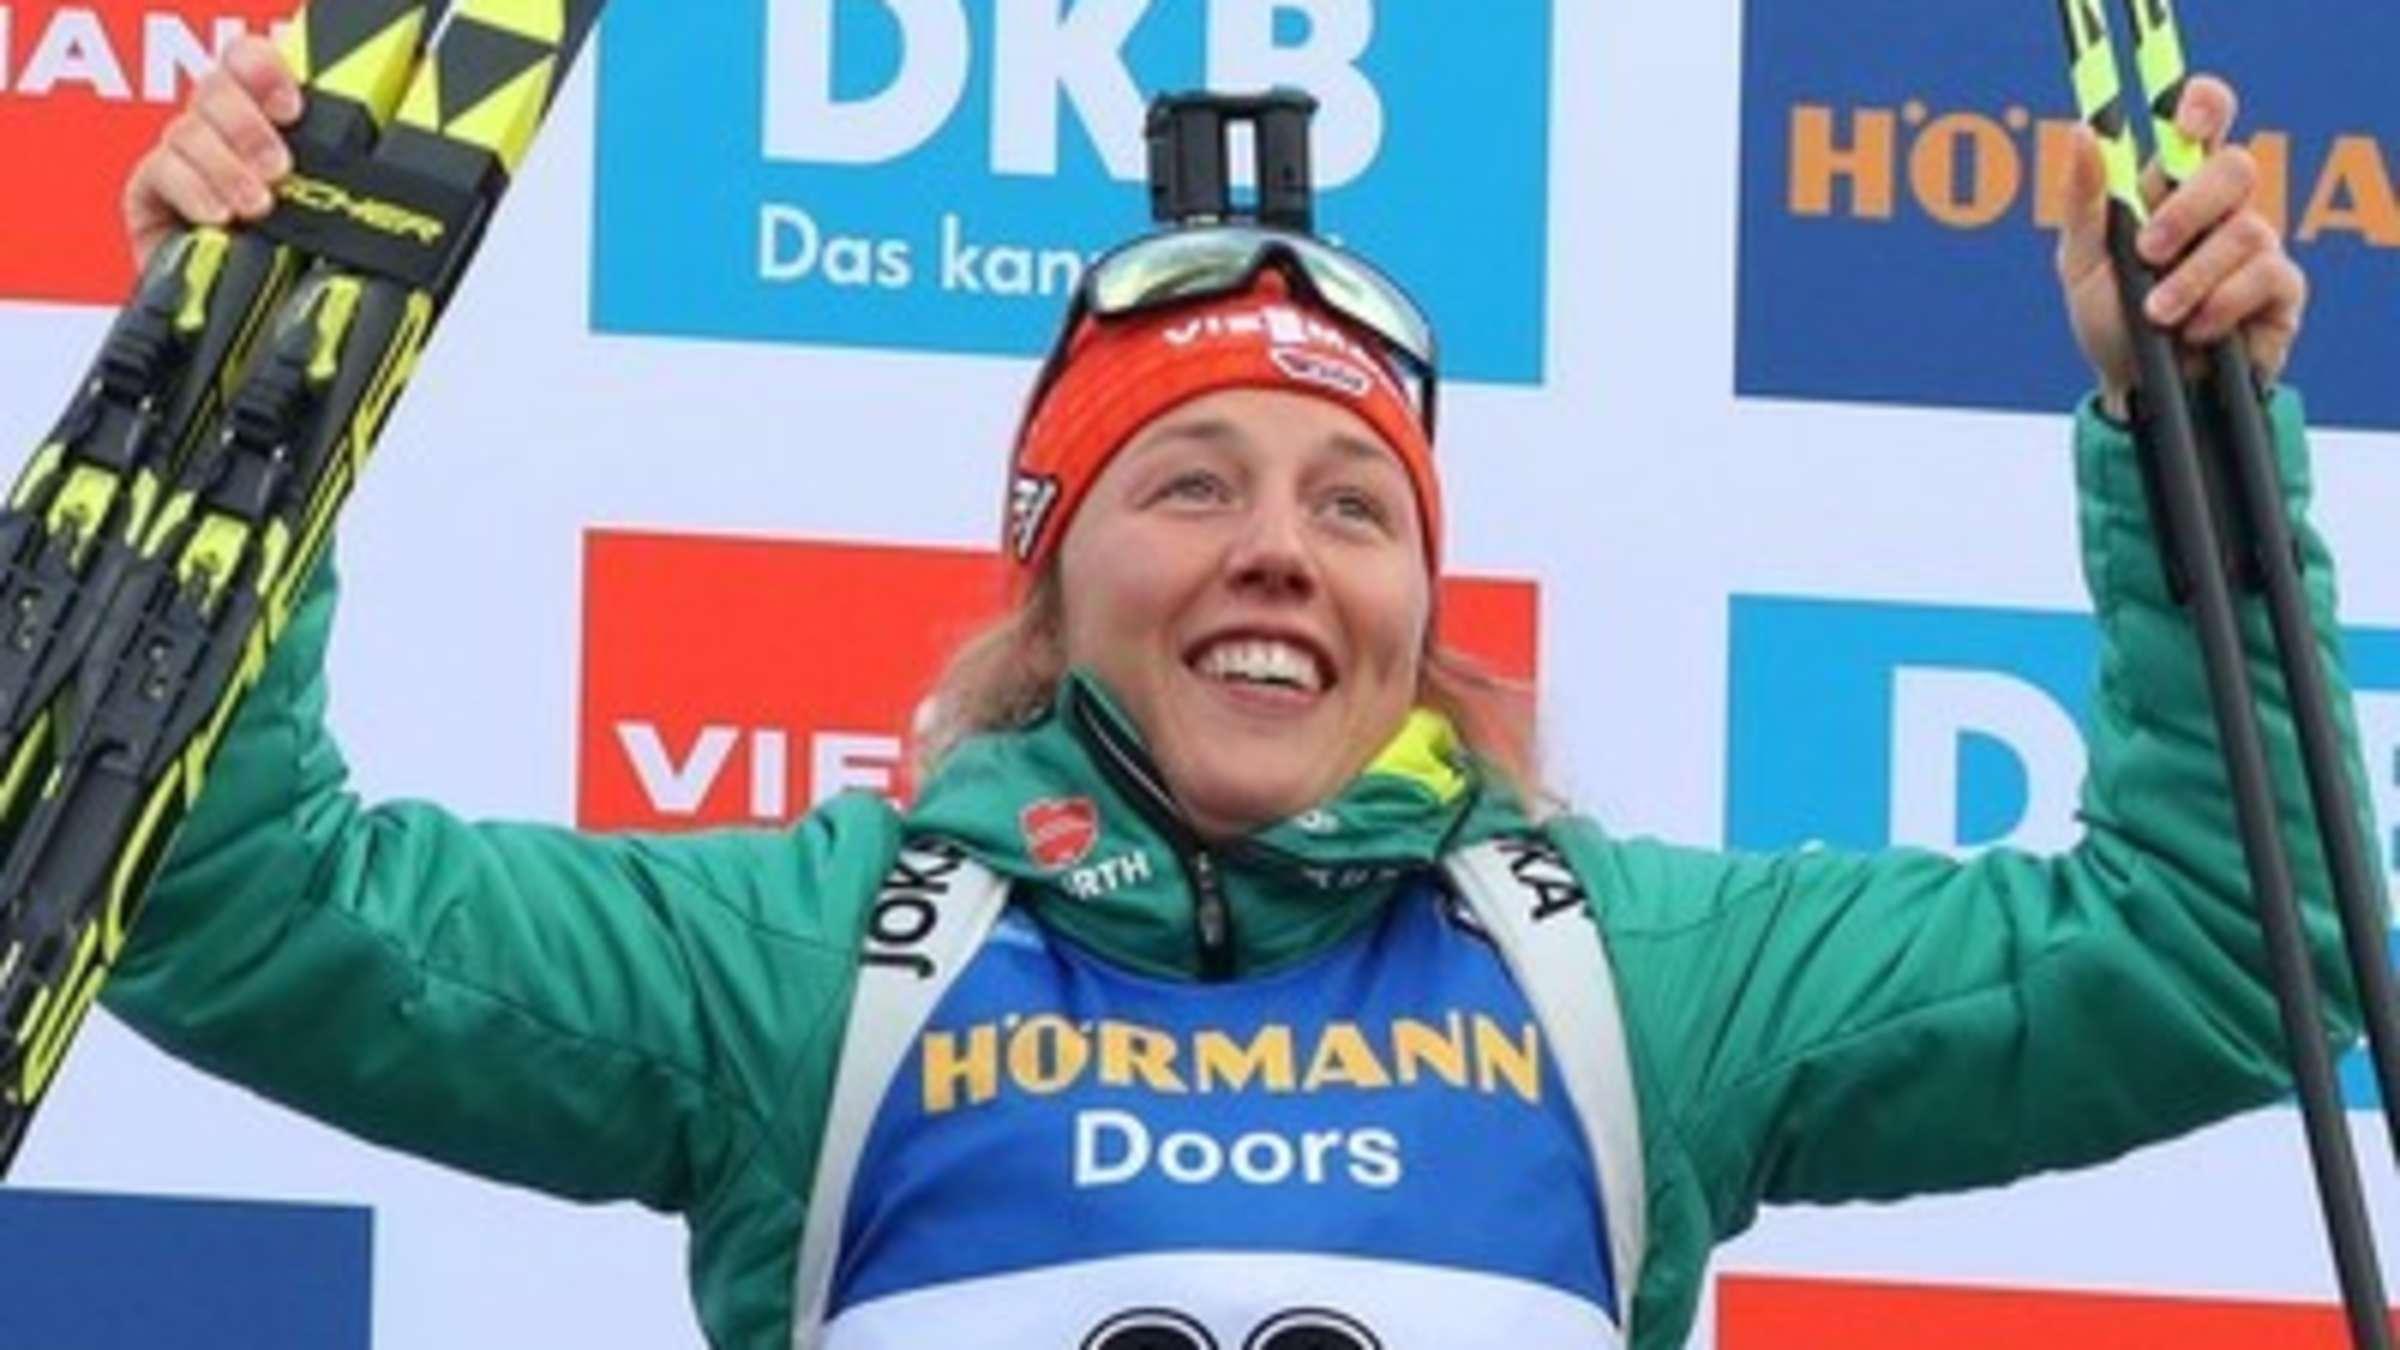 biathlon heute programm